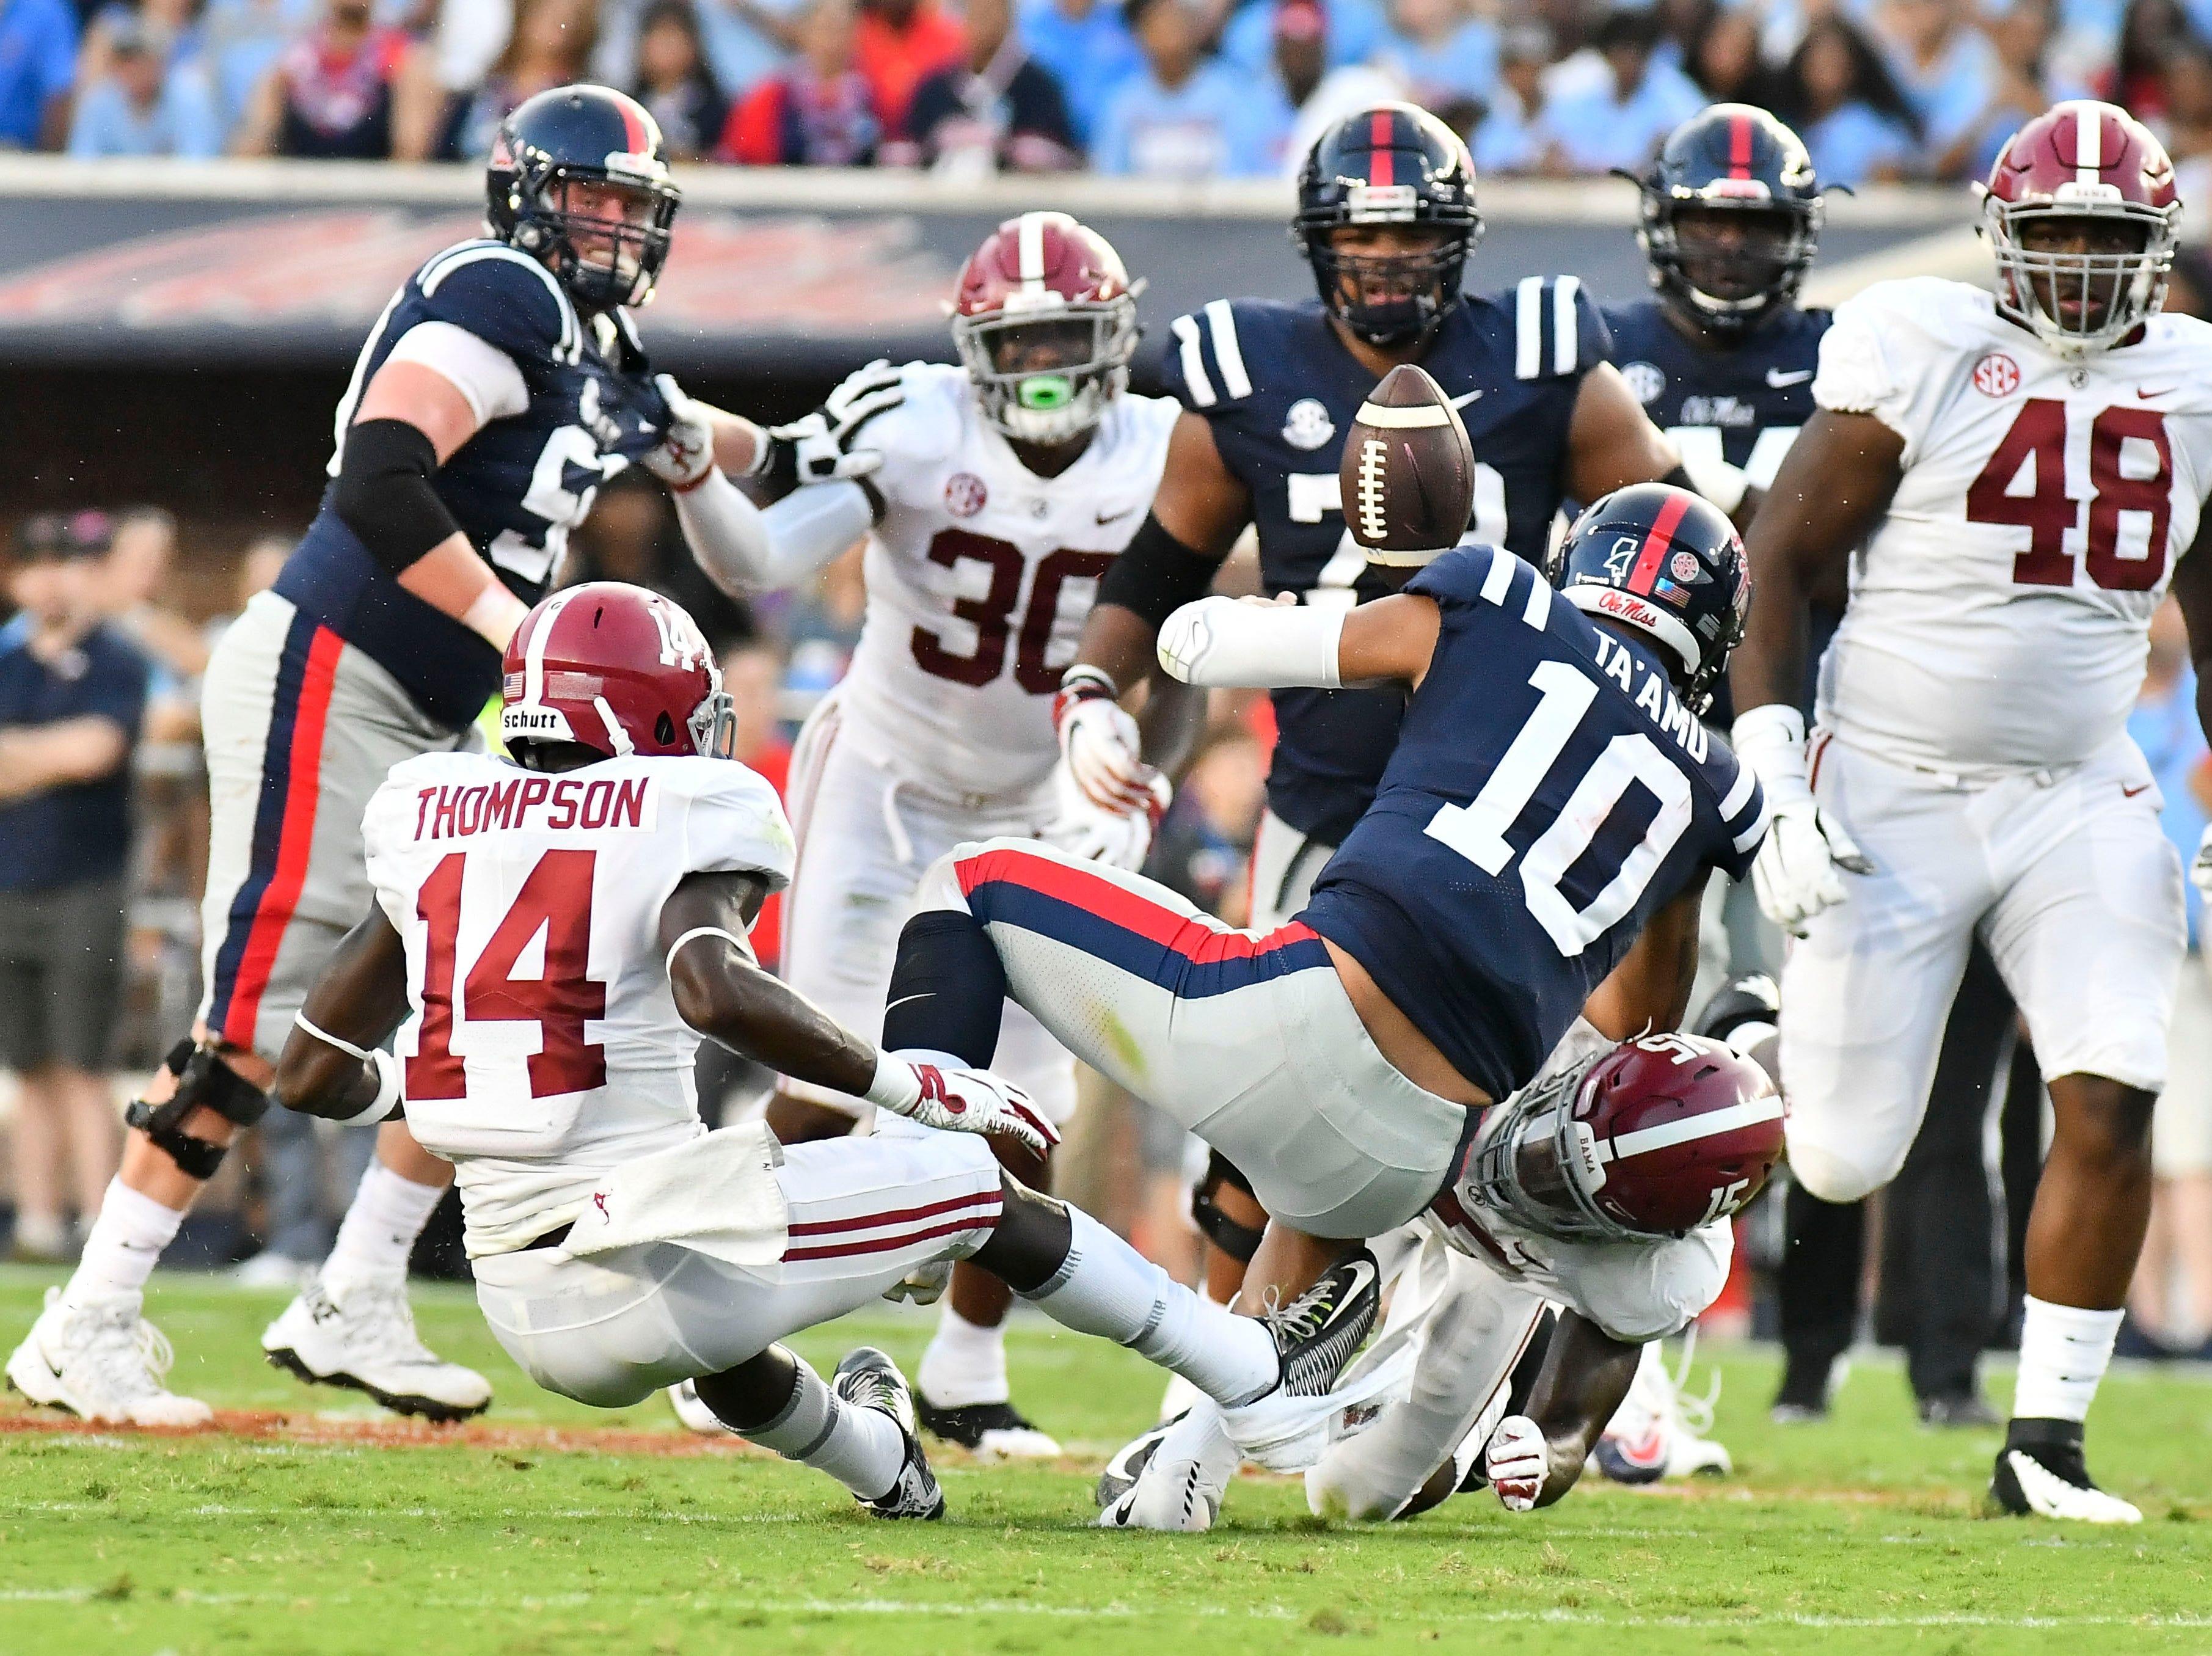 Mississippi Rebels quarterback Jordan Ta'amu (10) fumbles the ball after being hit by Alabama Crimson Tide defensive back Xavier McKinney (15) during the first quarter at Vaught-Hemingway Stadium.